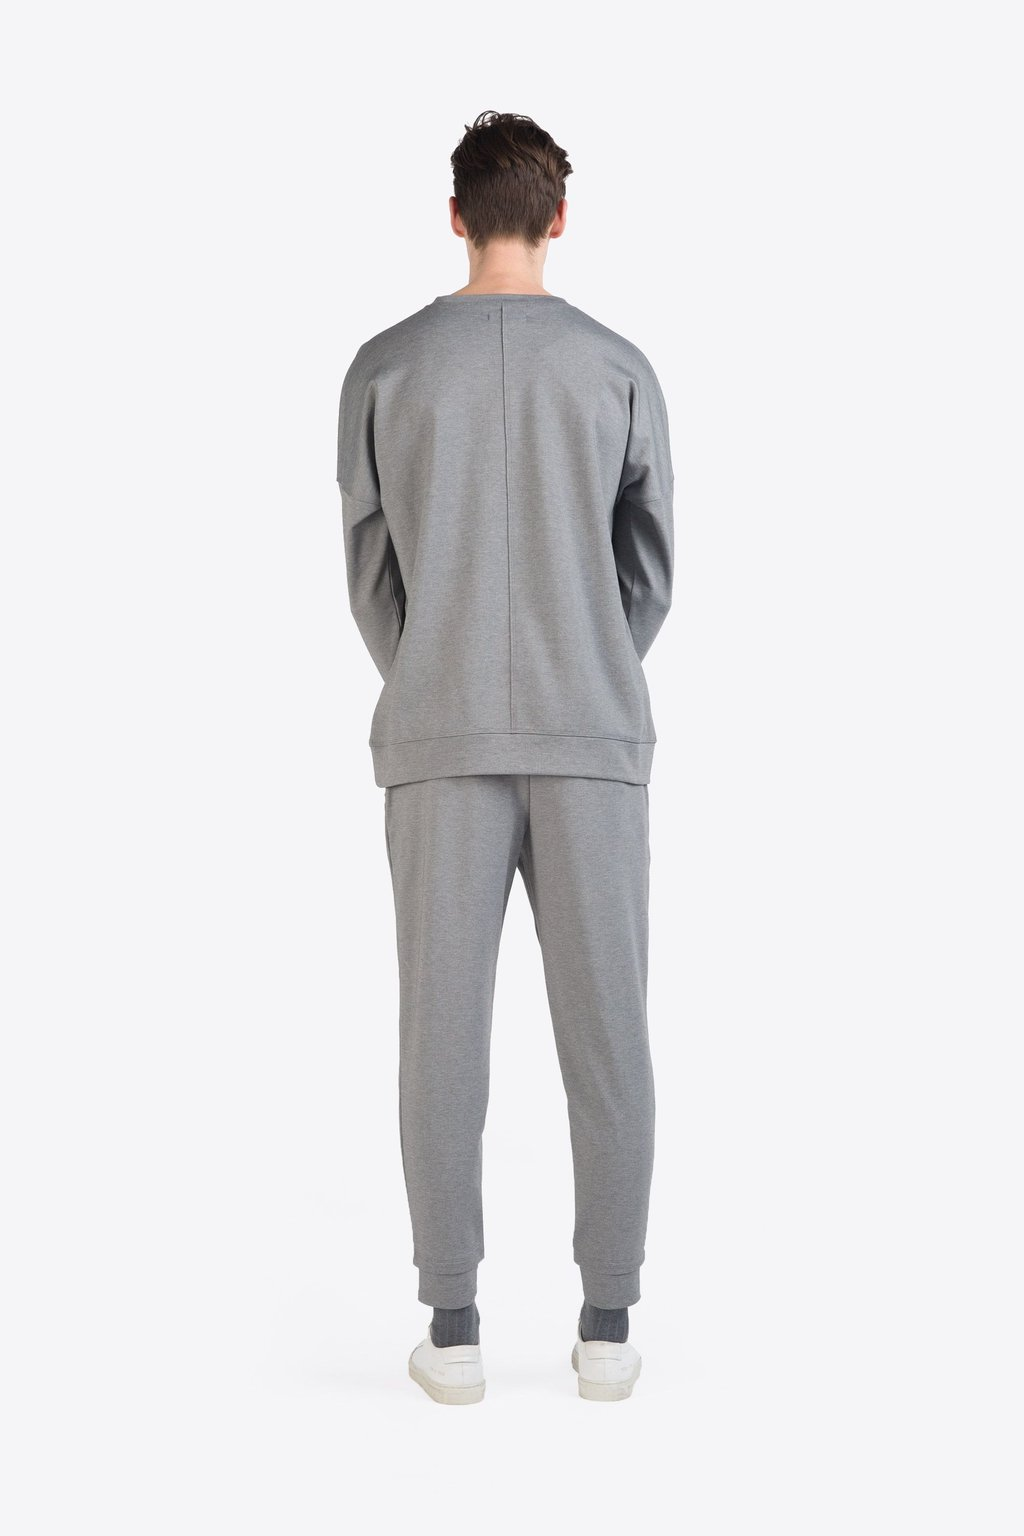 T Shirt 1206 Gray 8